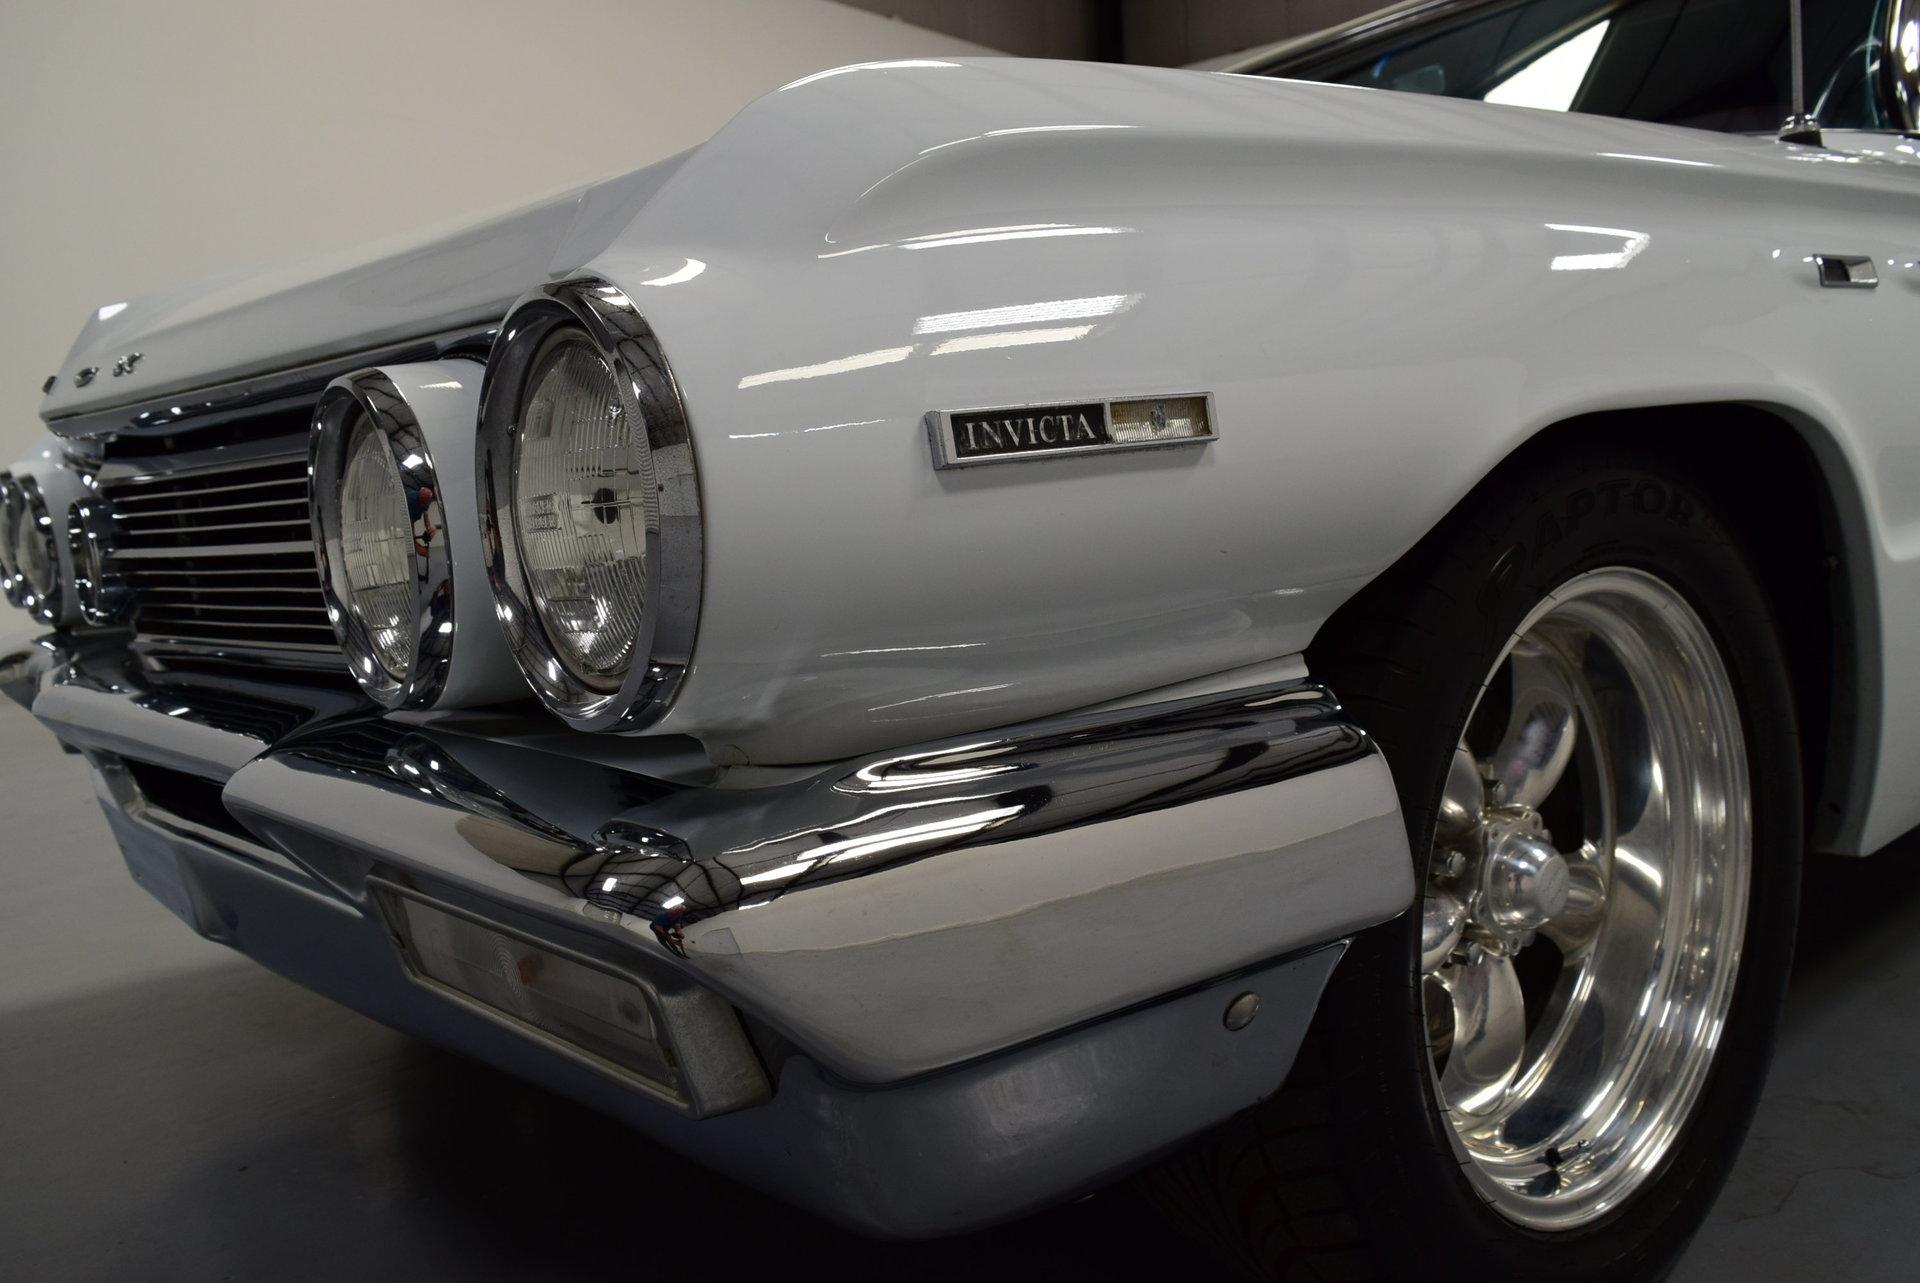 1962 Buick Invicta Shelton Classics Amp Performance